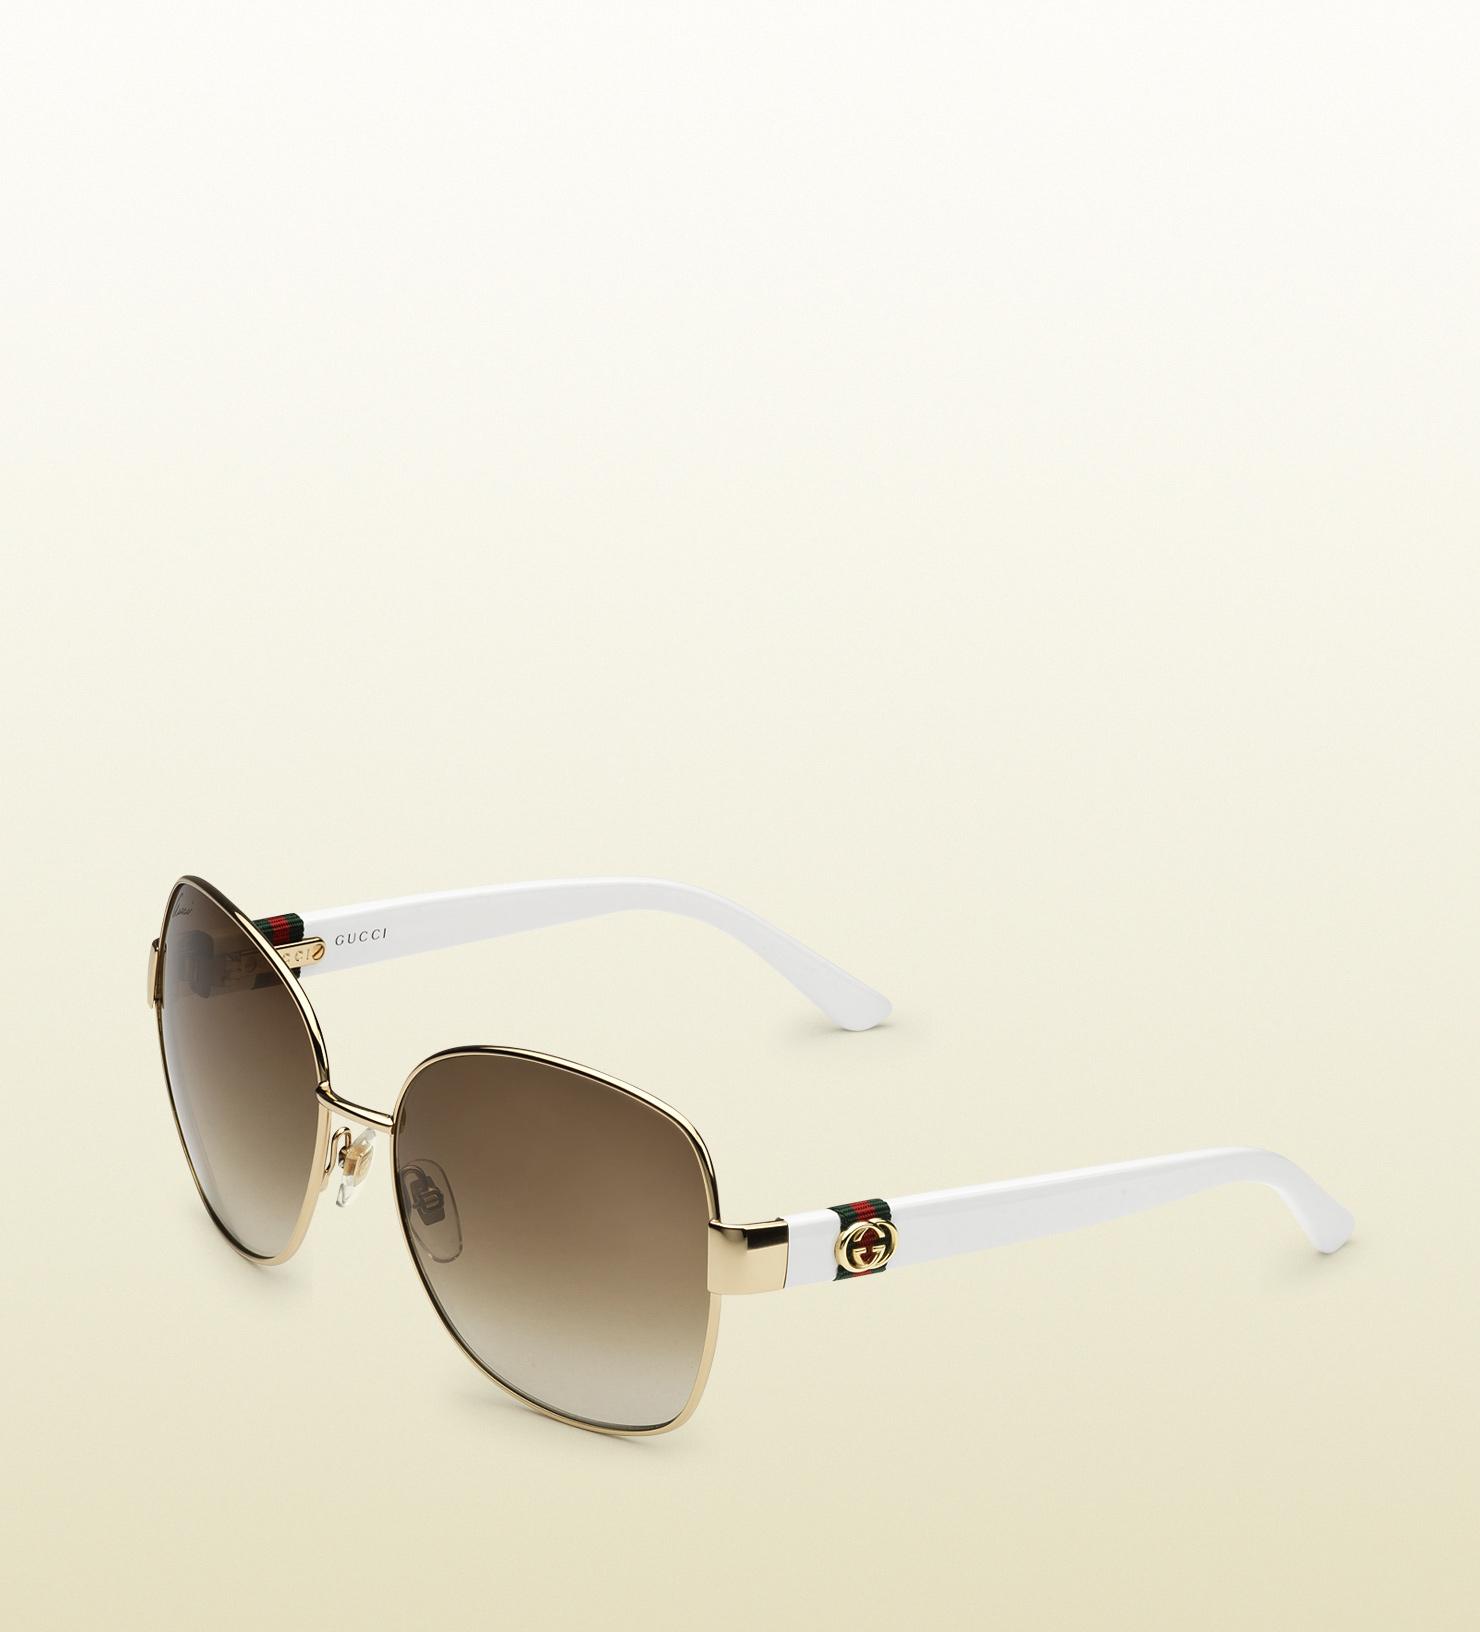 1c3758324 Gucci Gold Square Sunglasses in Metallic - Lyst